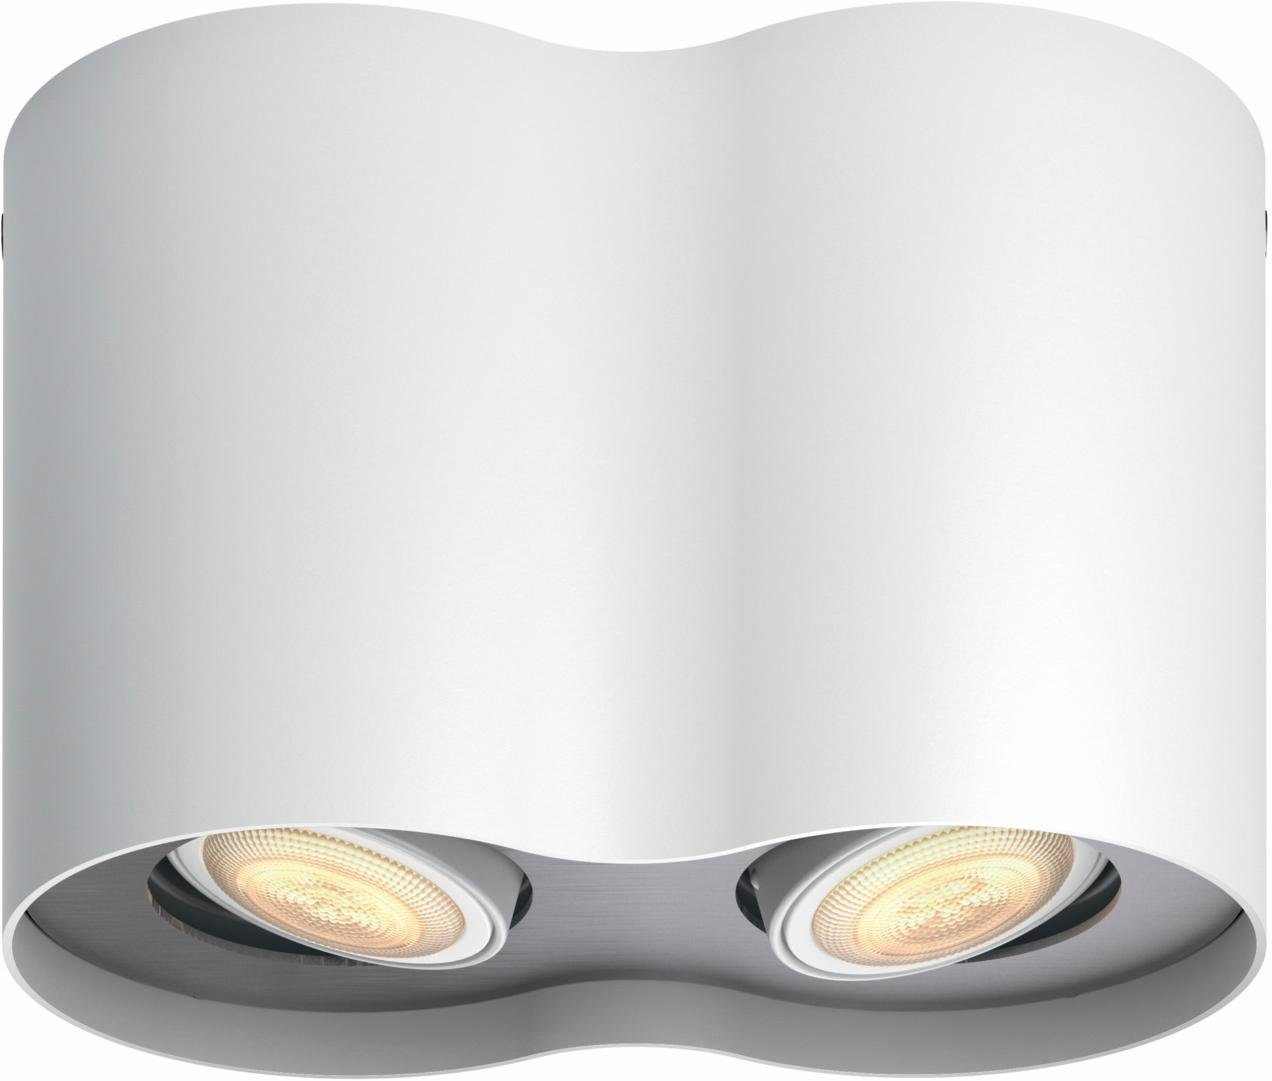 Philips Hue LED Deckenspot »Pillar«, 2-flammig, Smart Home